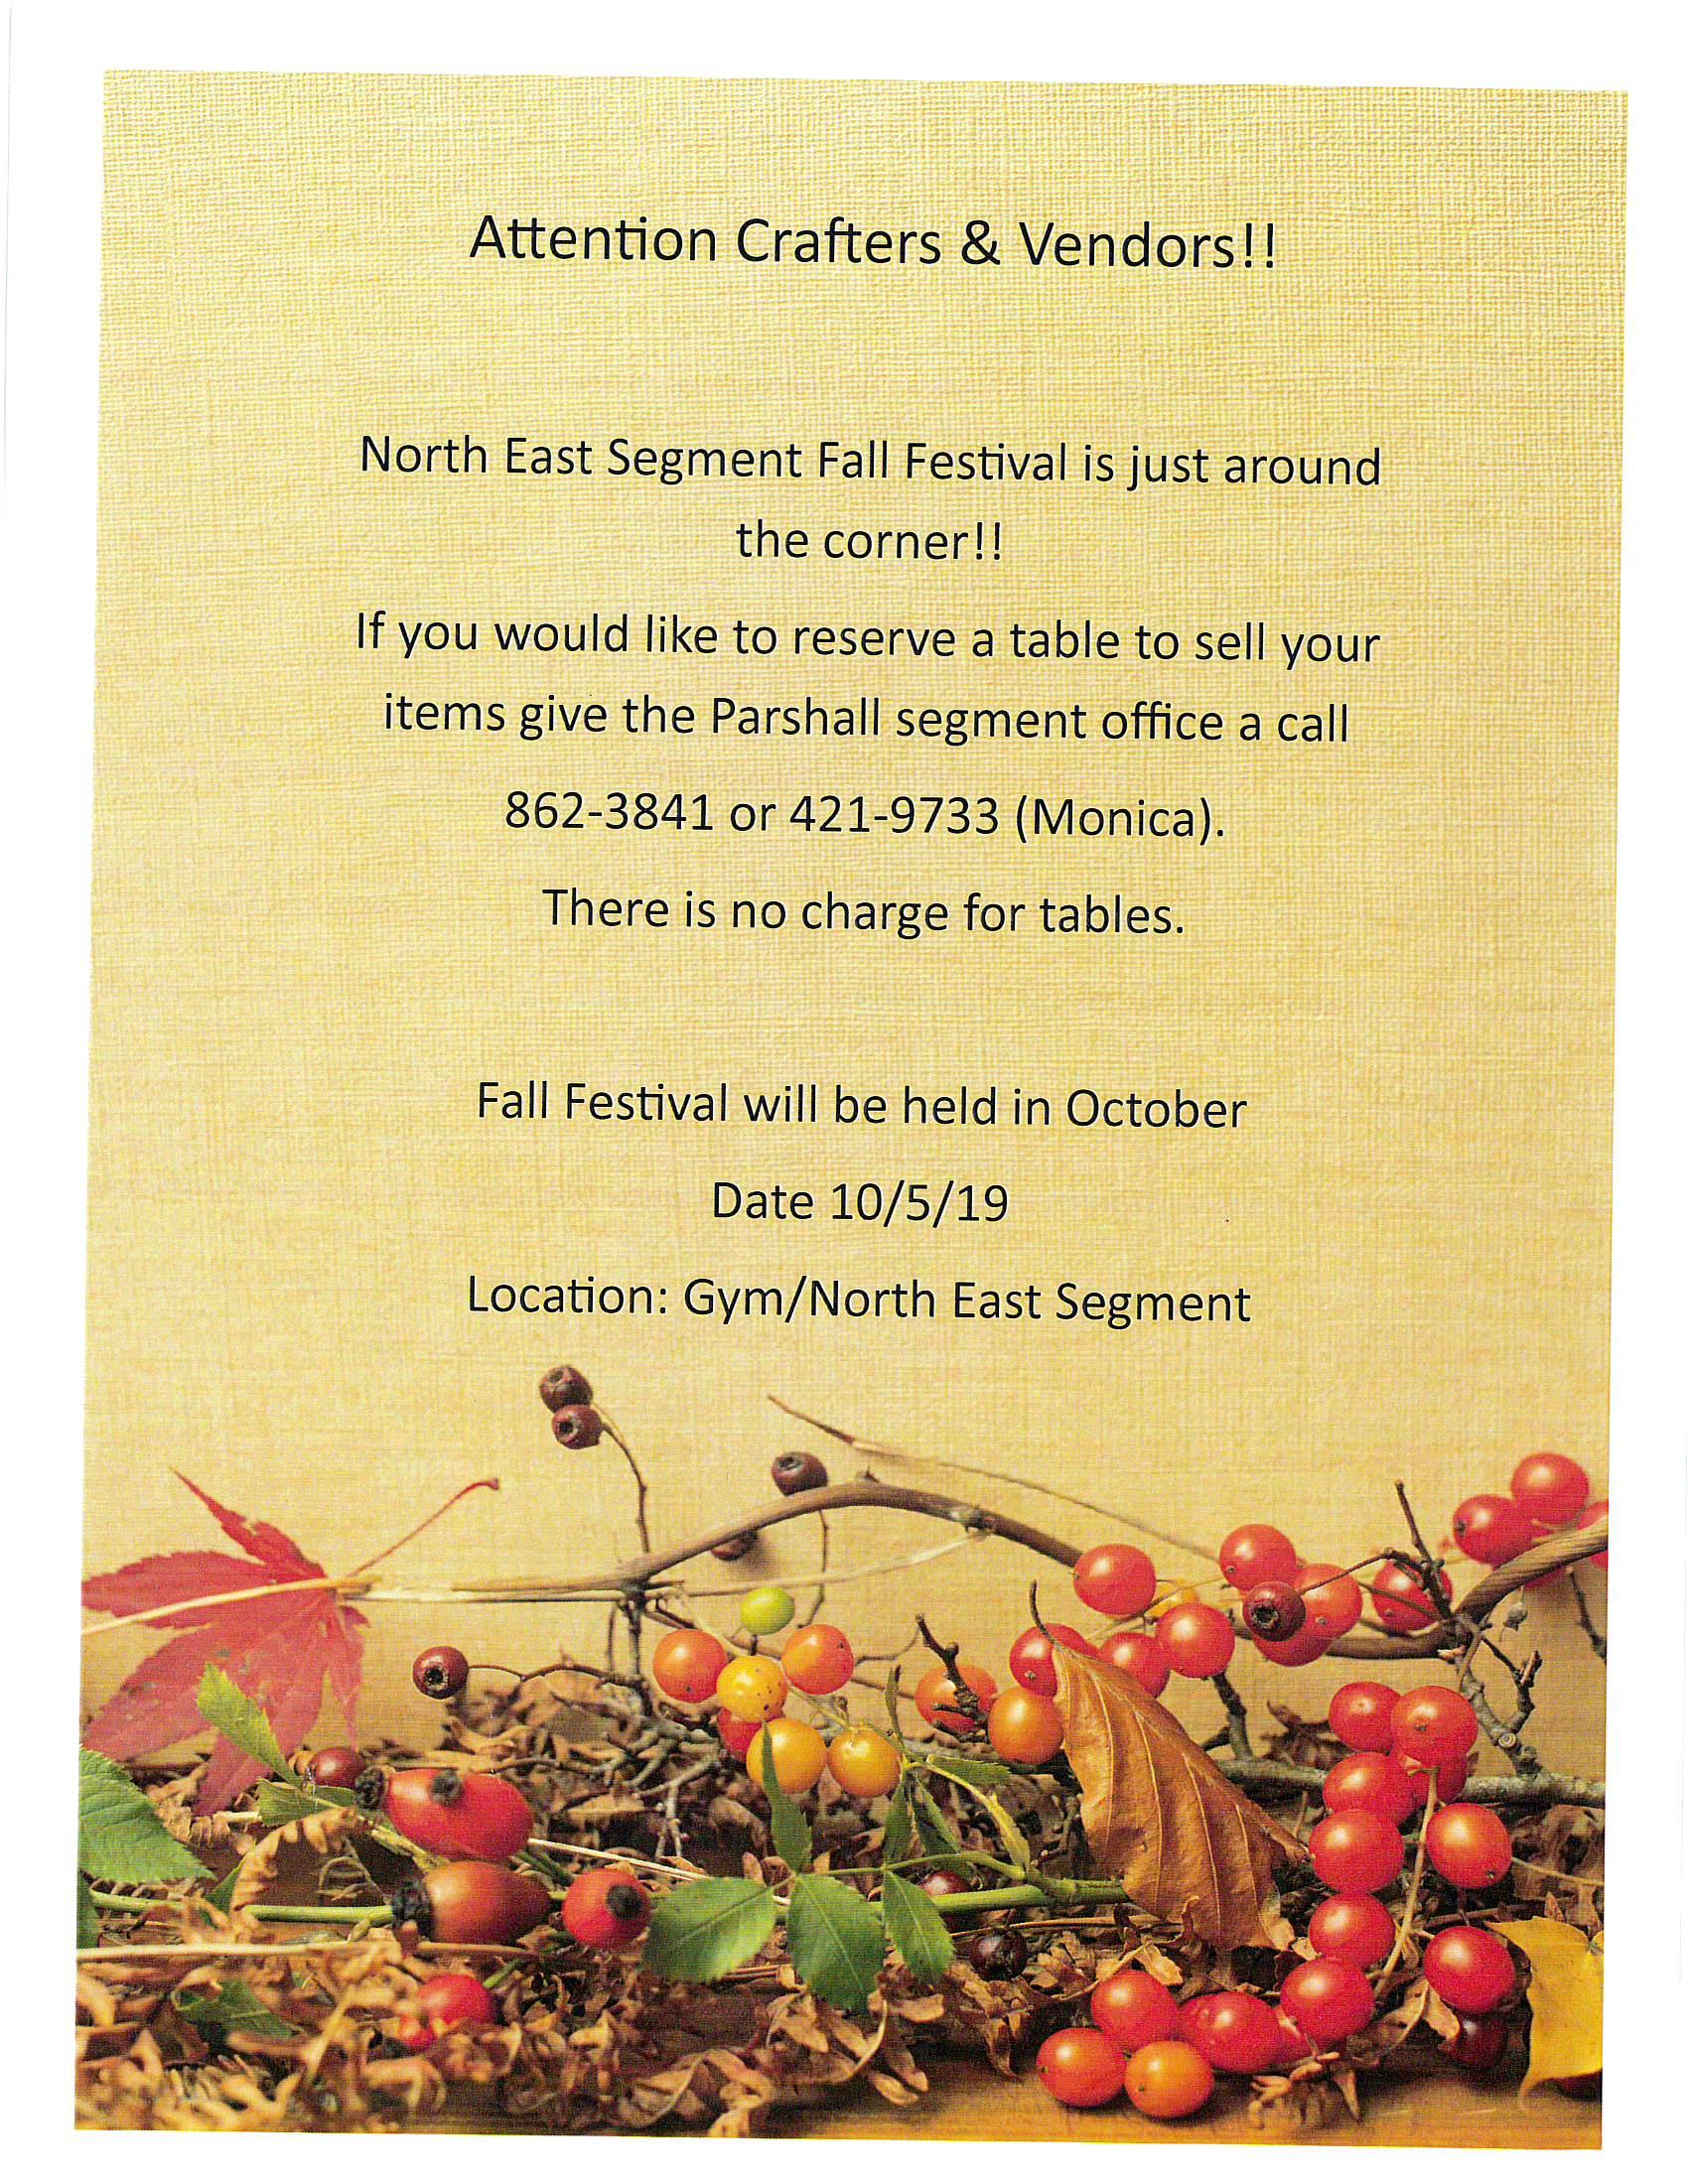 North East Segment Fall Festival_Page_2.jpg